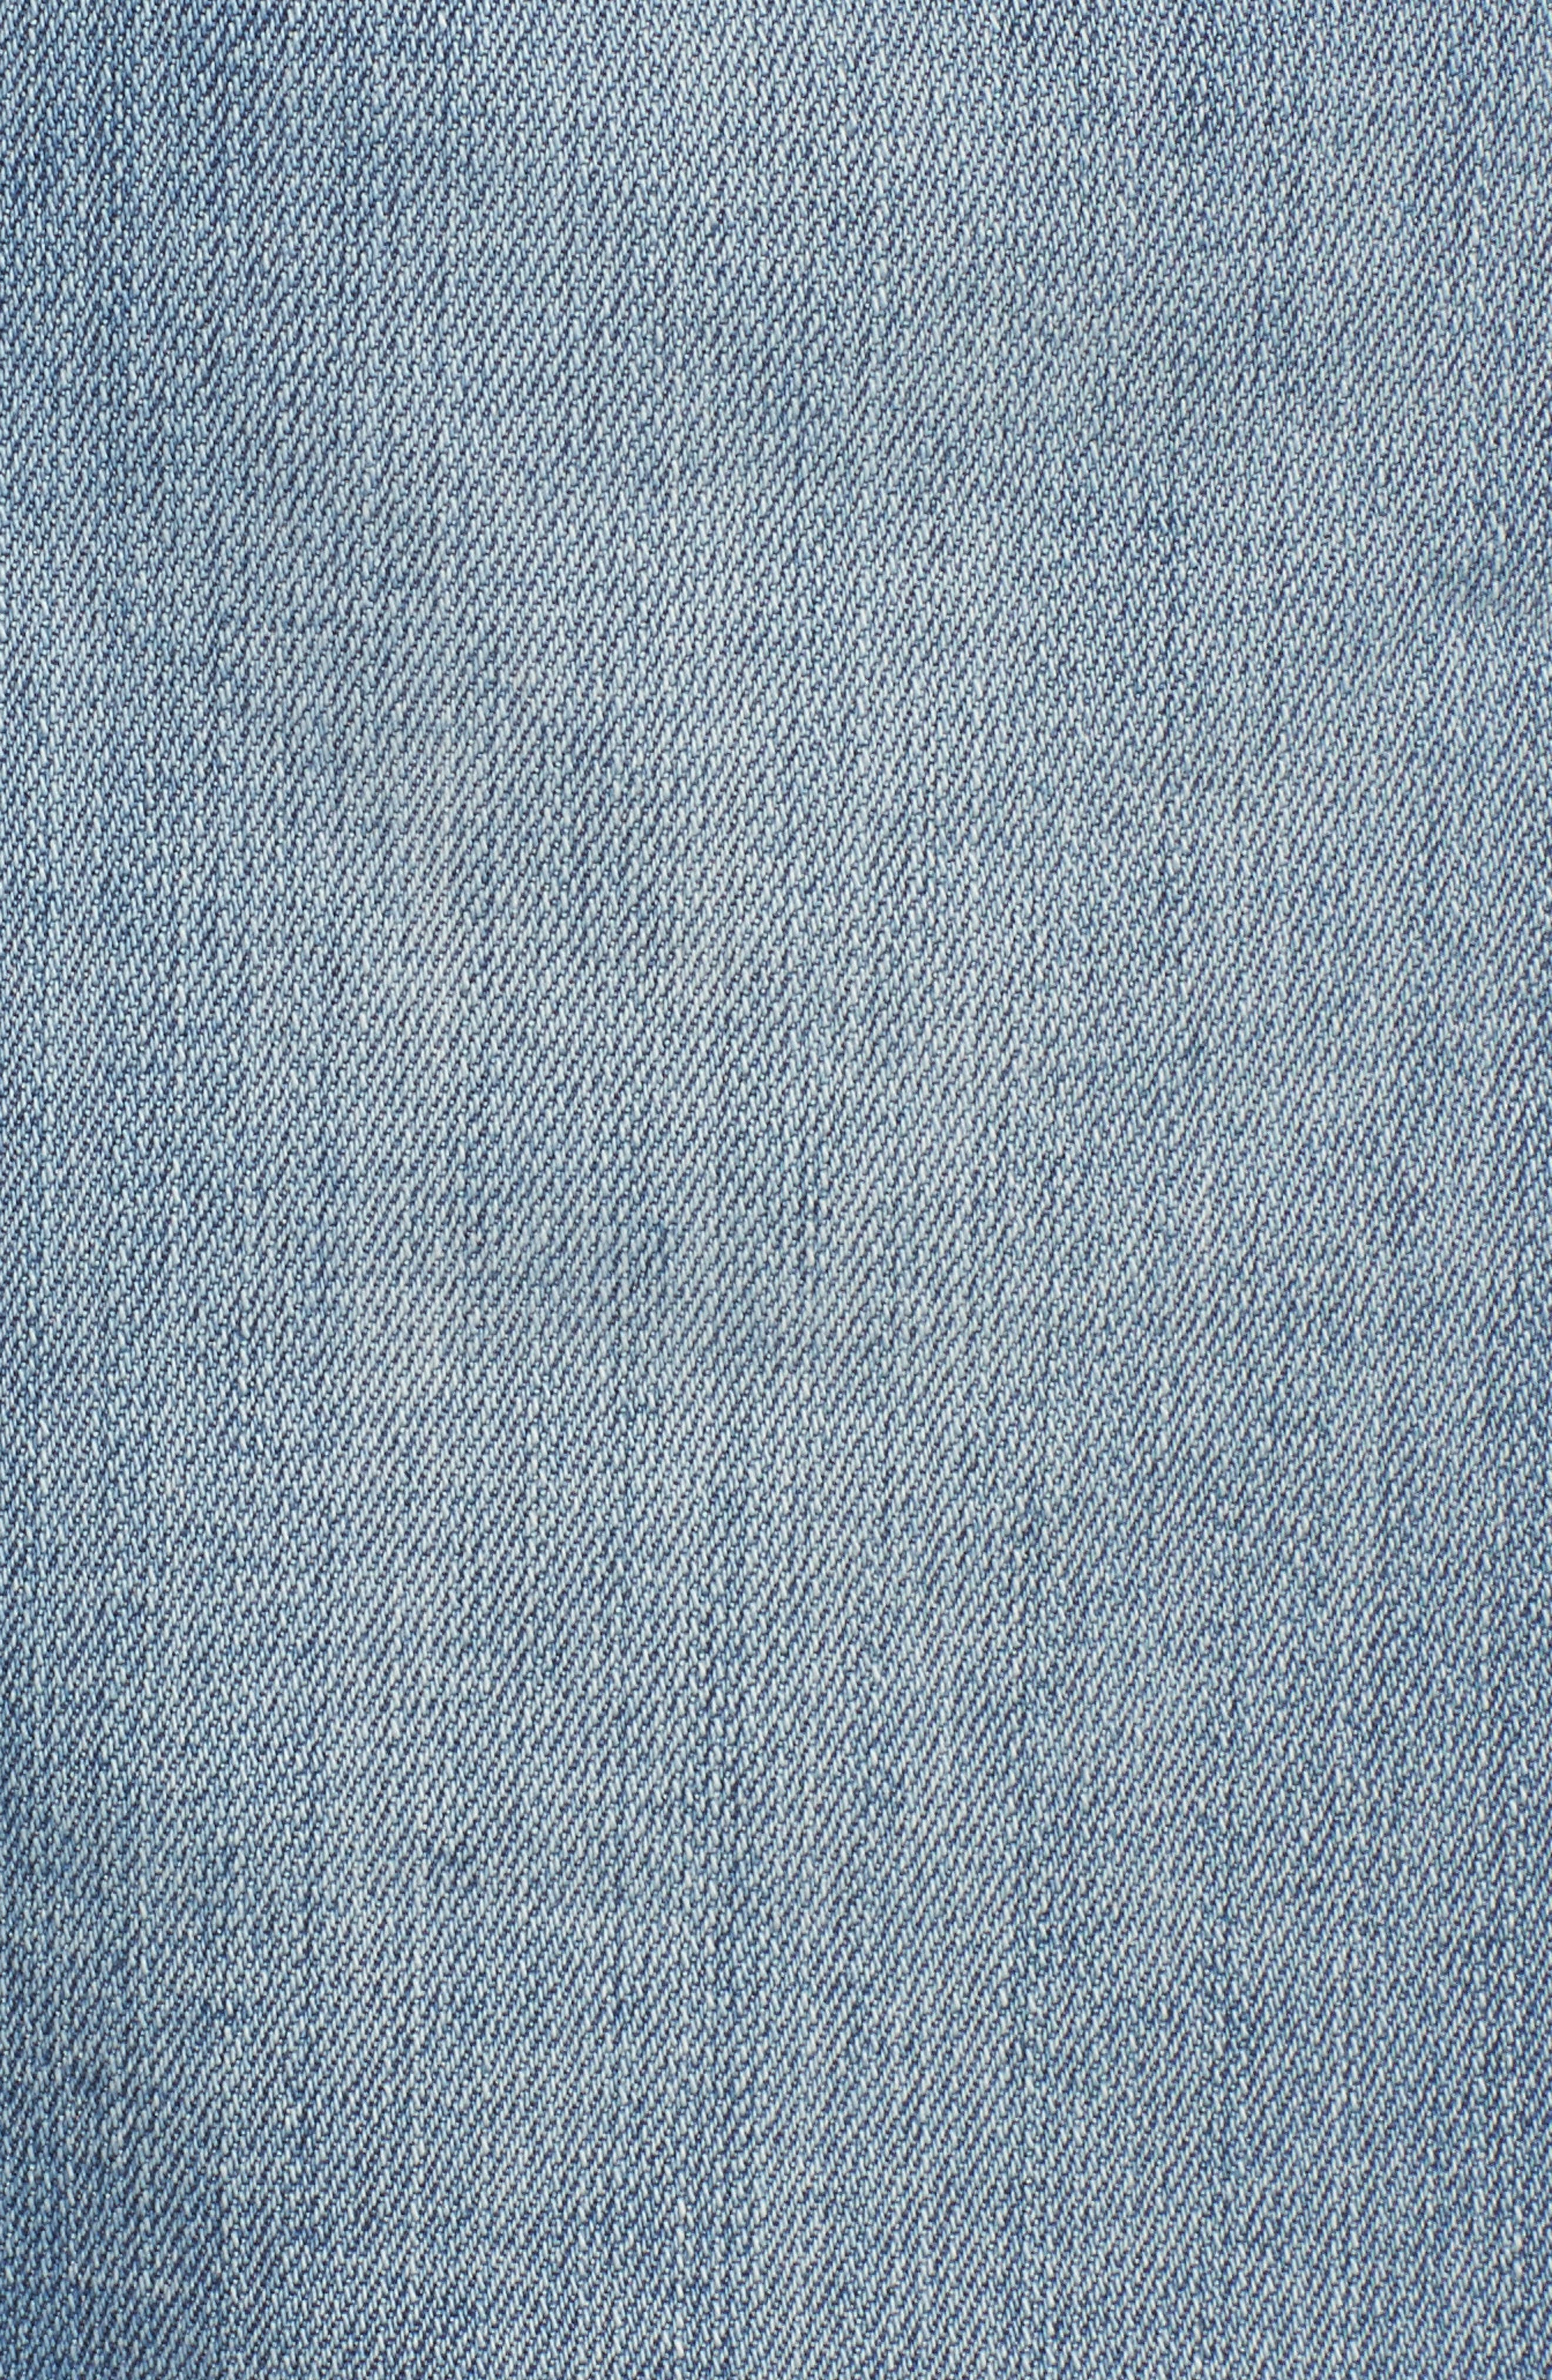 High Waist Distressed Denim Shorts,                             Alternate thumbnail 5, color,                             Medium Wash